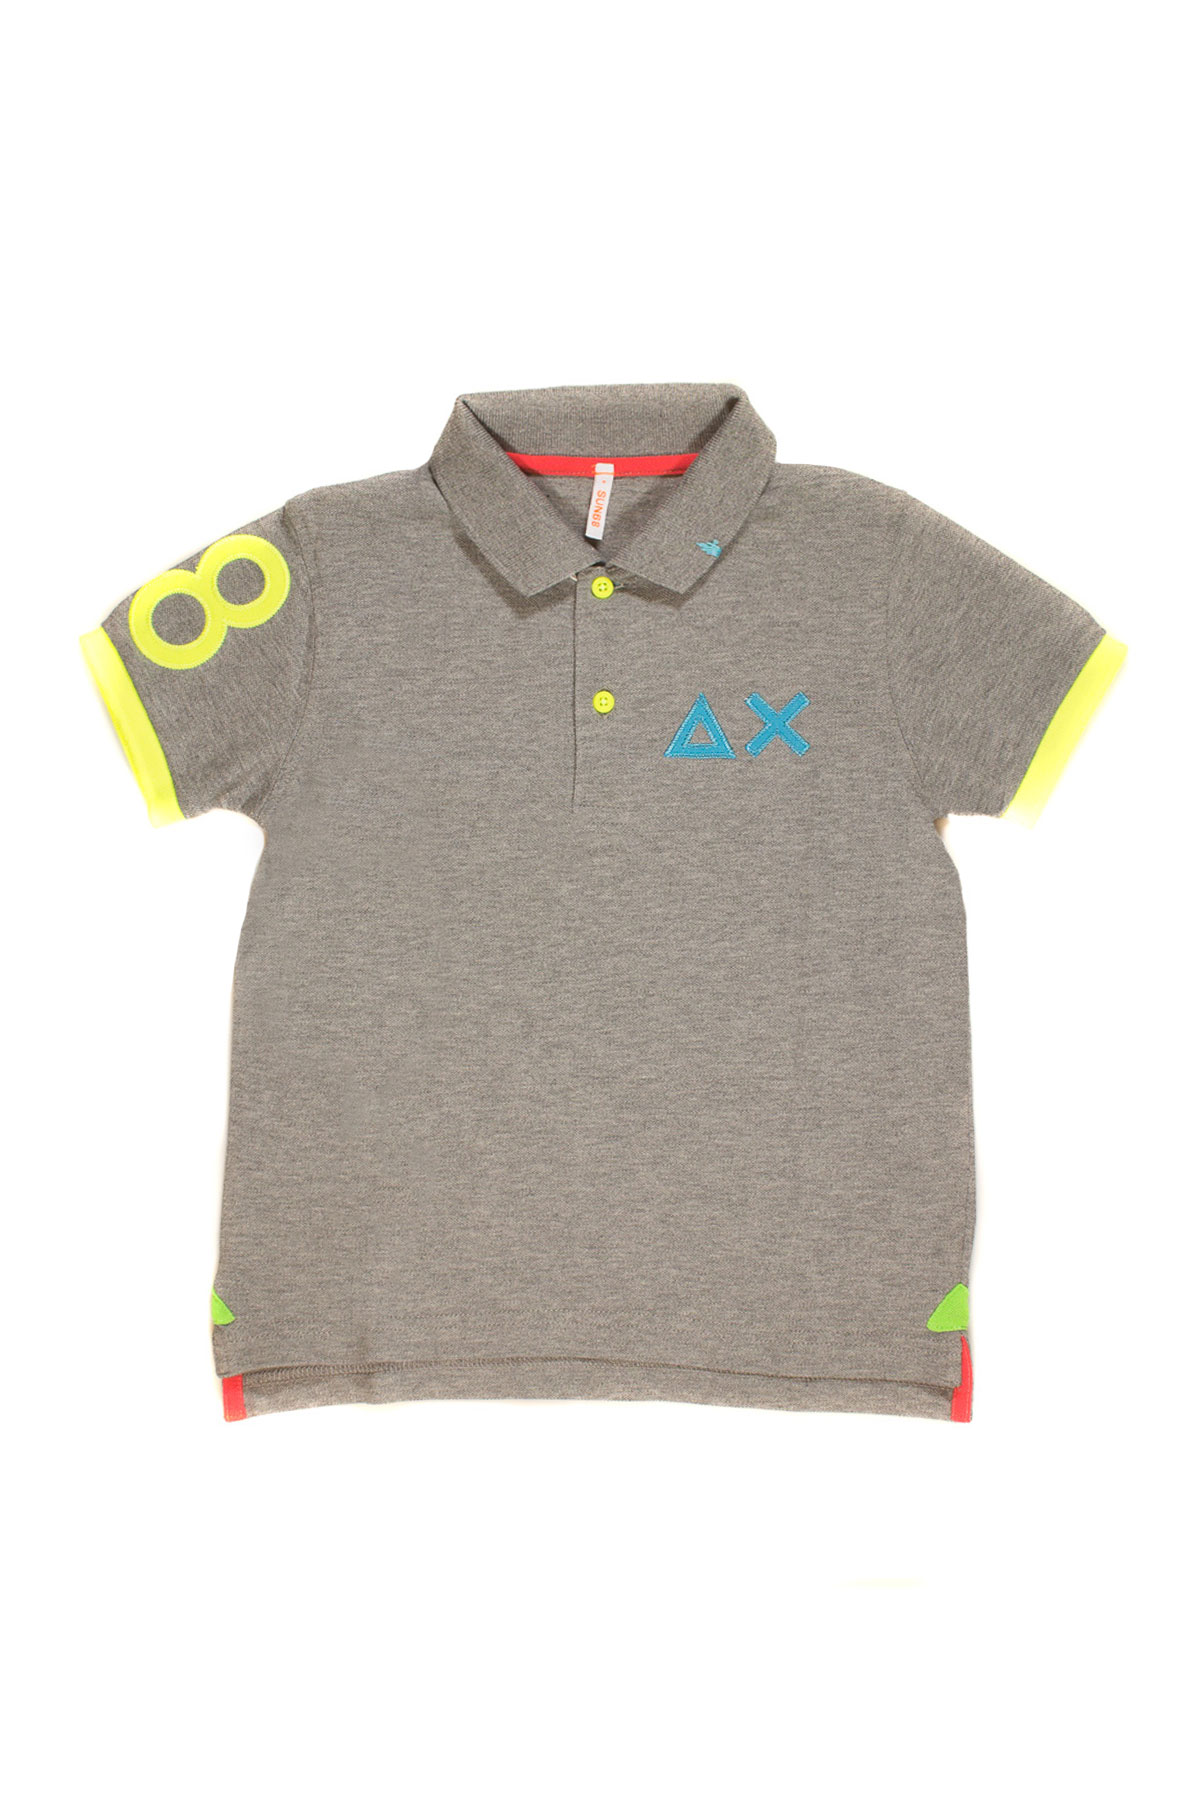 Ralph Lauren Polo Shirts Canada 411 Yellow - Prism